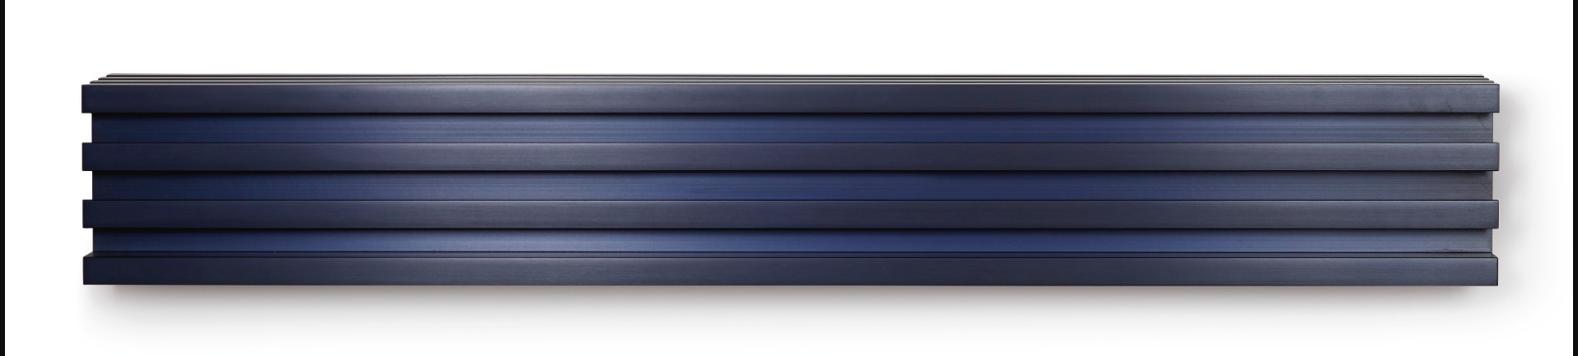 Donald Judd-Untitled (Cobalt)-1991